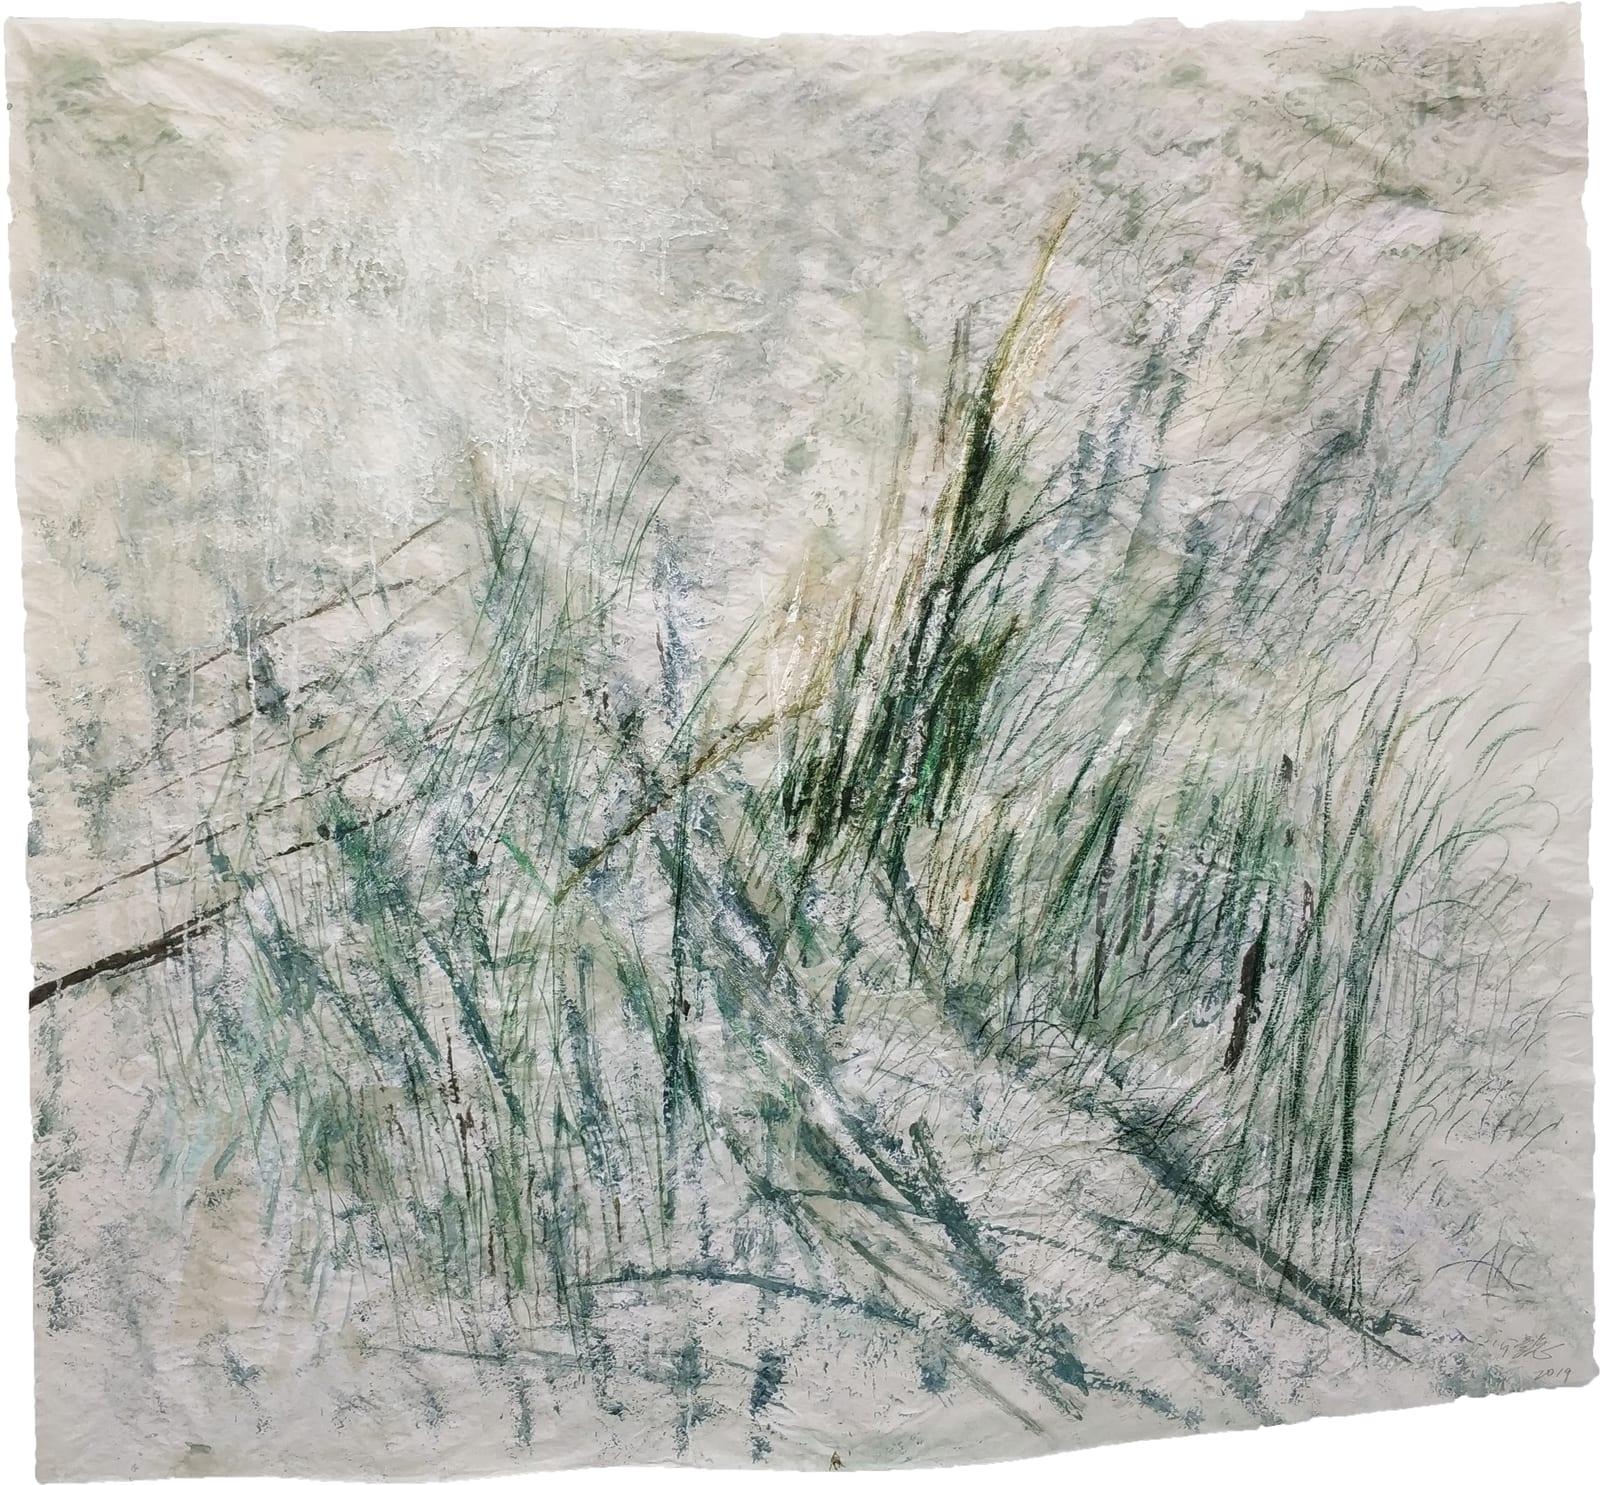 Wang Gongyi 王公懿, Leaves of Grass No.5 草葉集之五, 2019